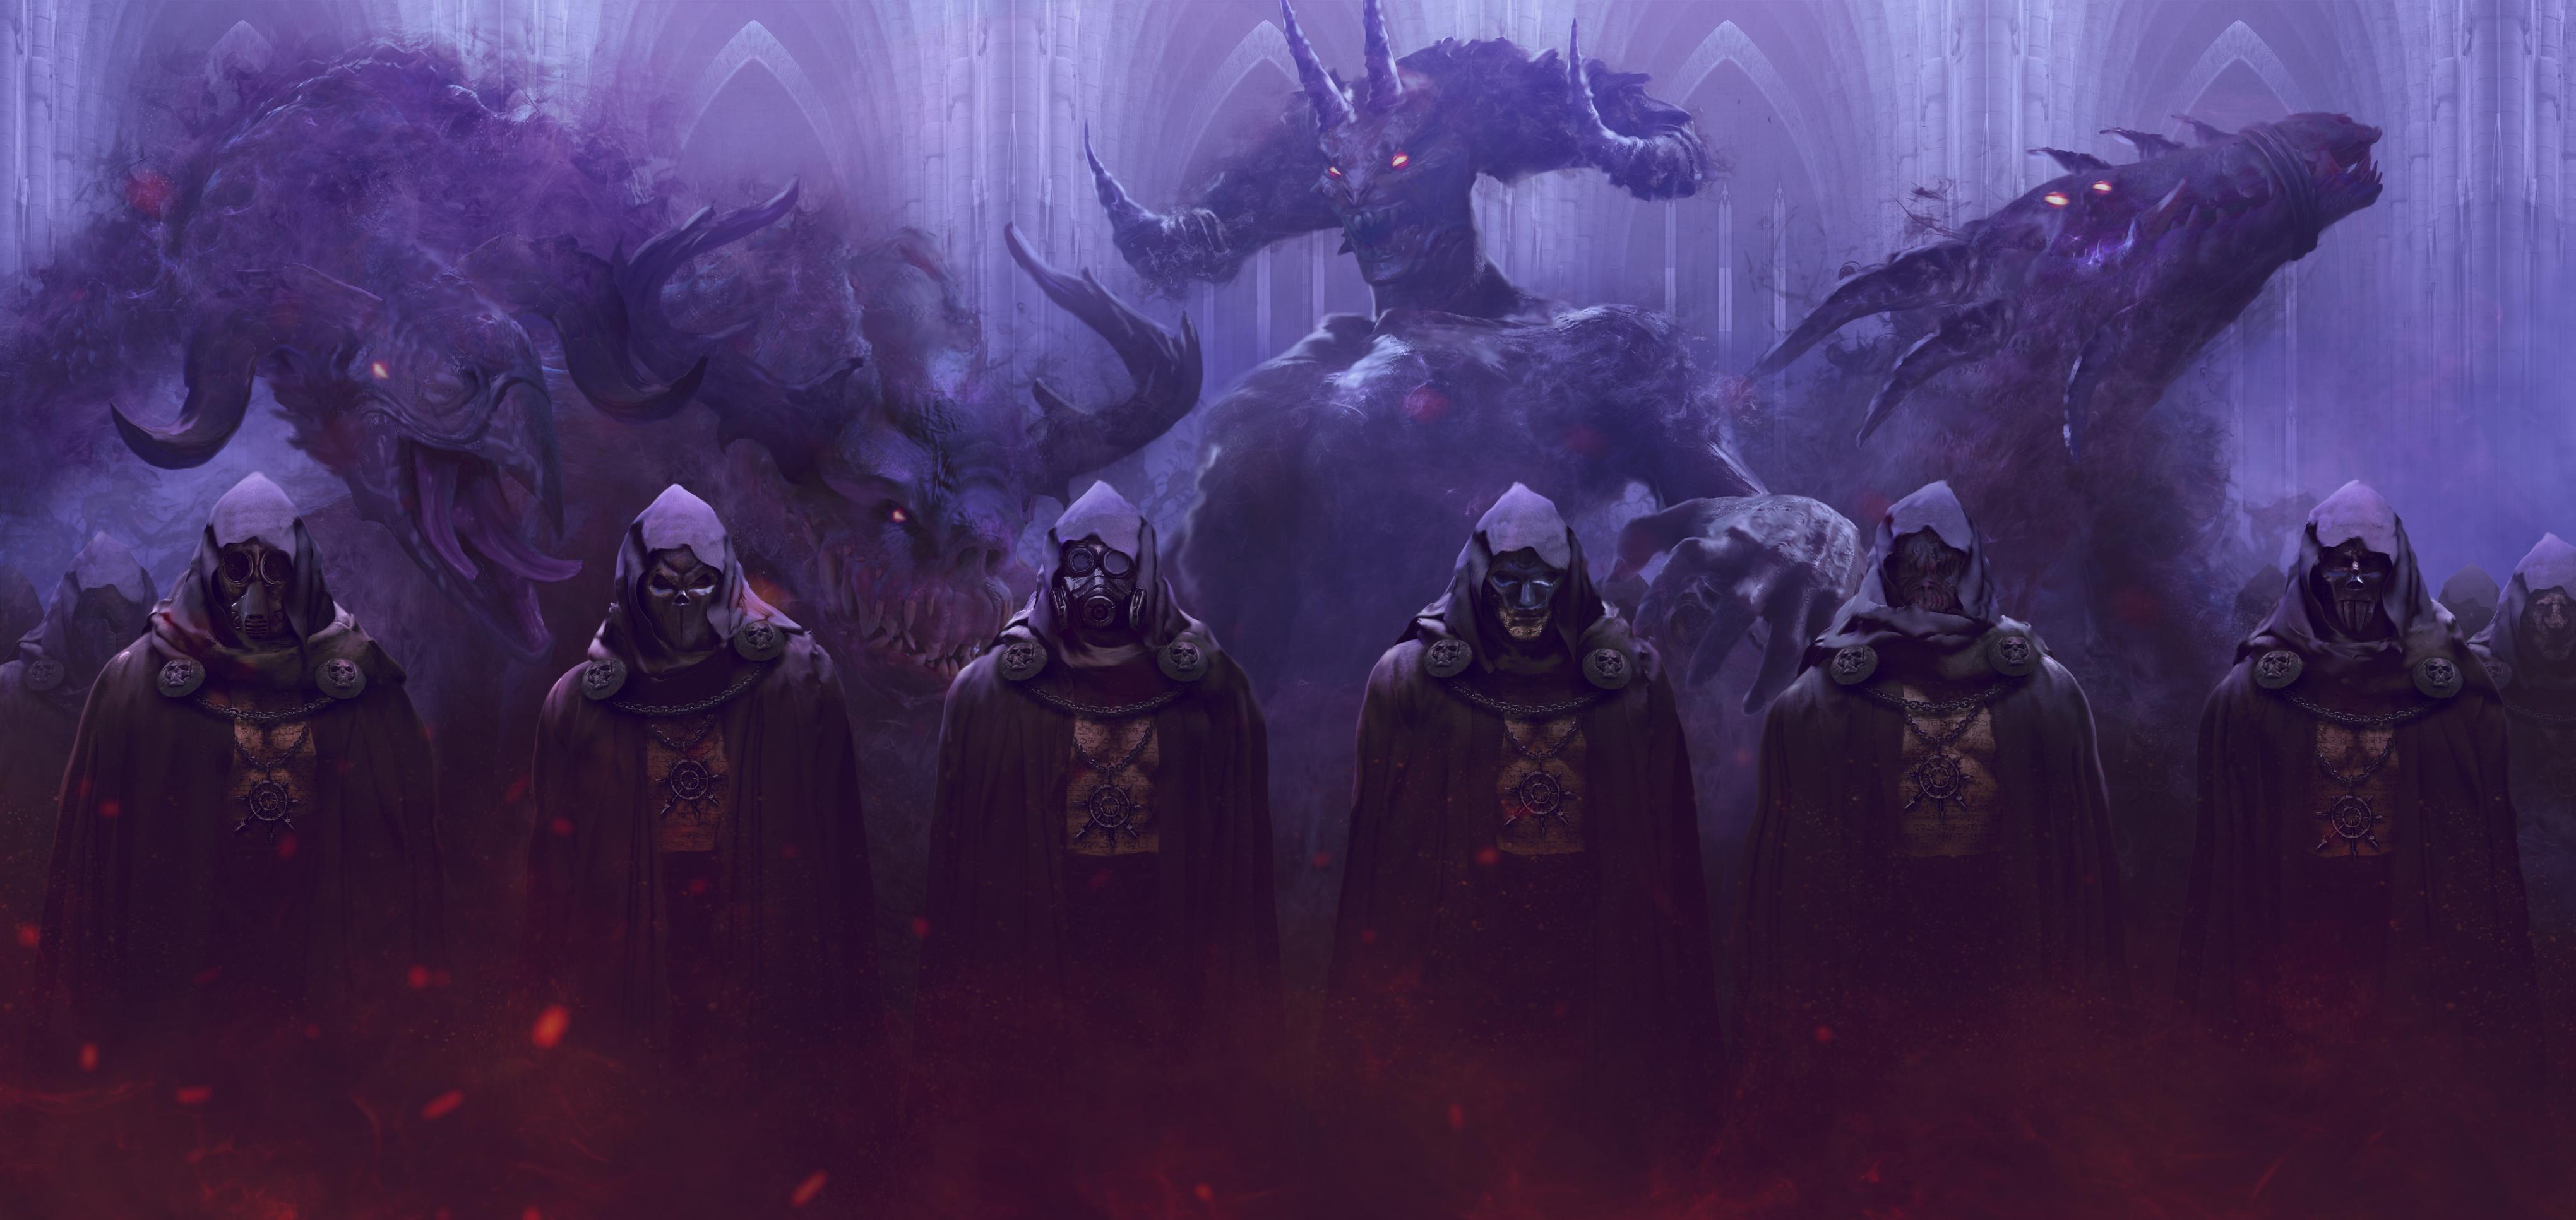 Battlefleet Gothic: Armada 2 Chaos Campaign artwork